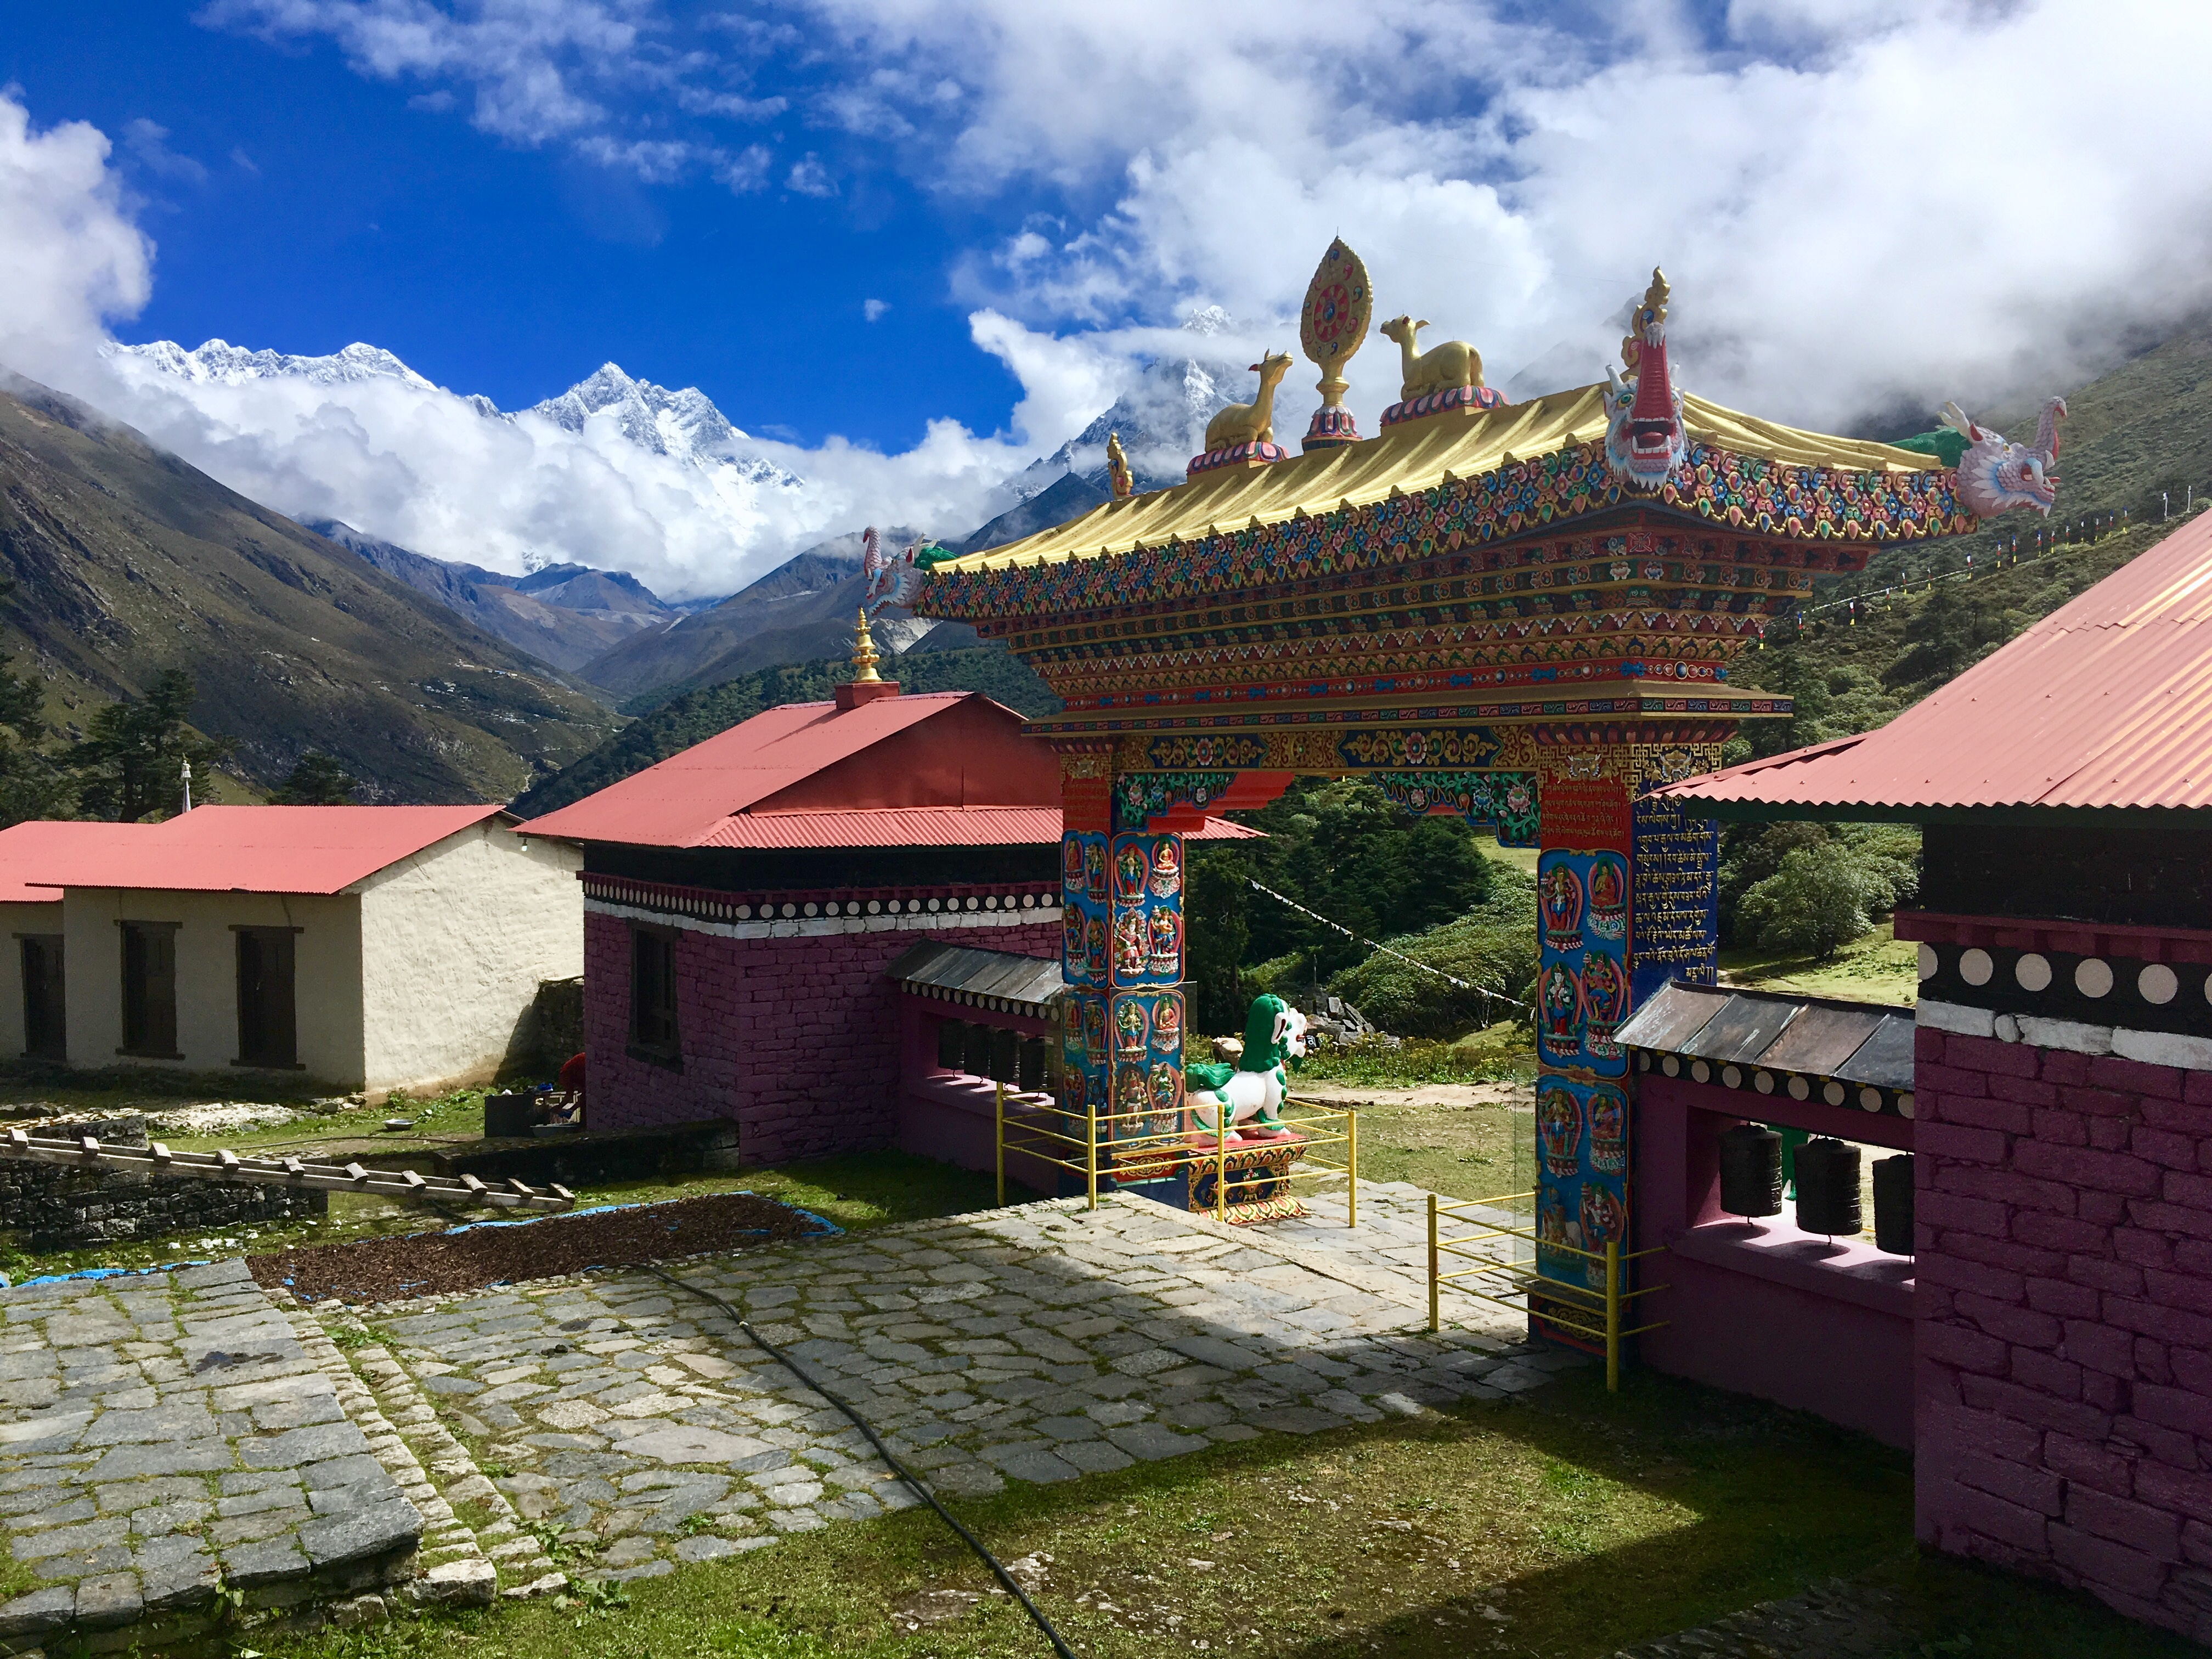 Monastery in Nepal